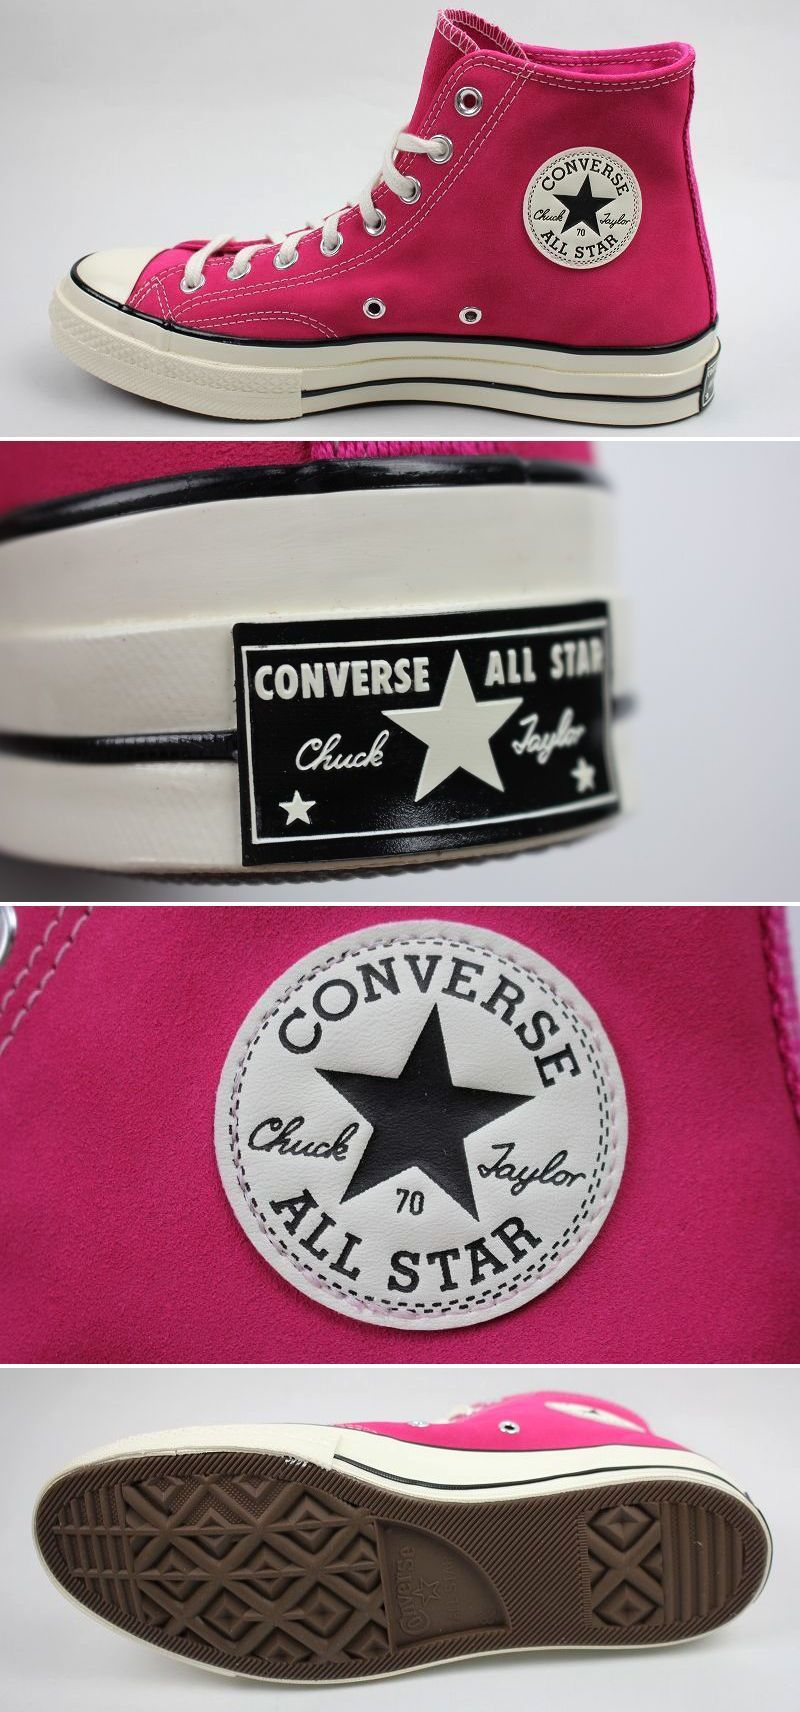 CONVERSE USA / CHUCK 70 HI SUEDE / deep pink×white